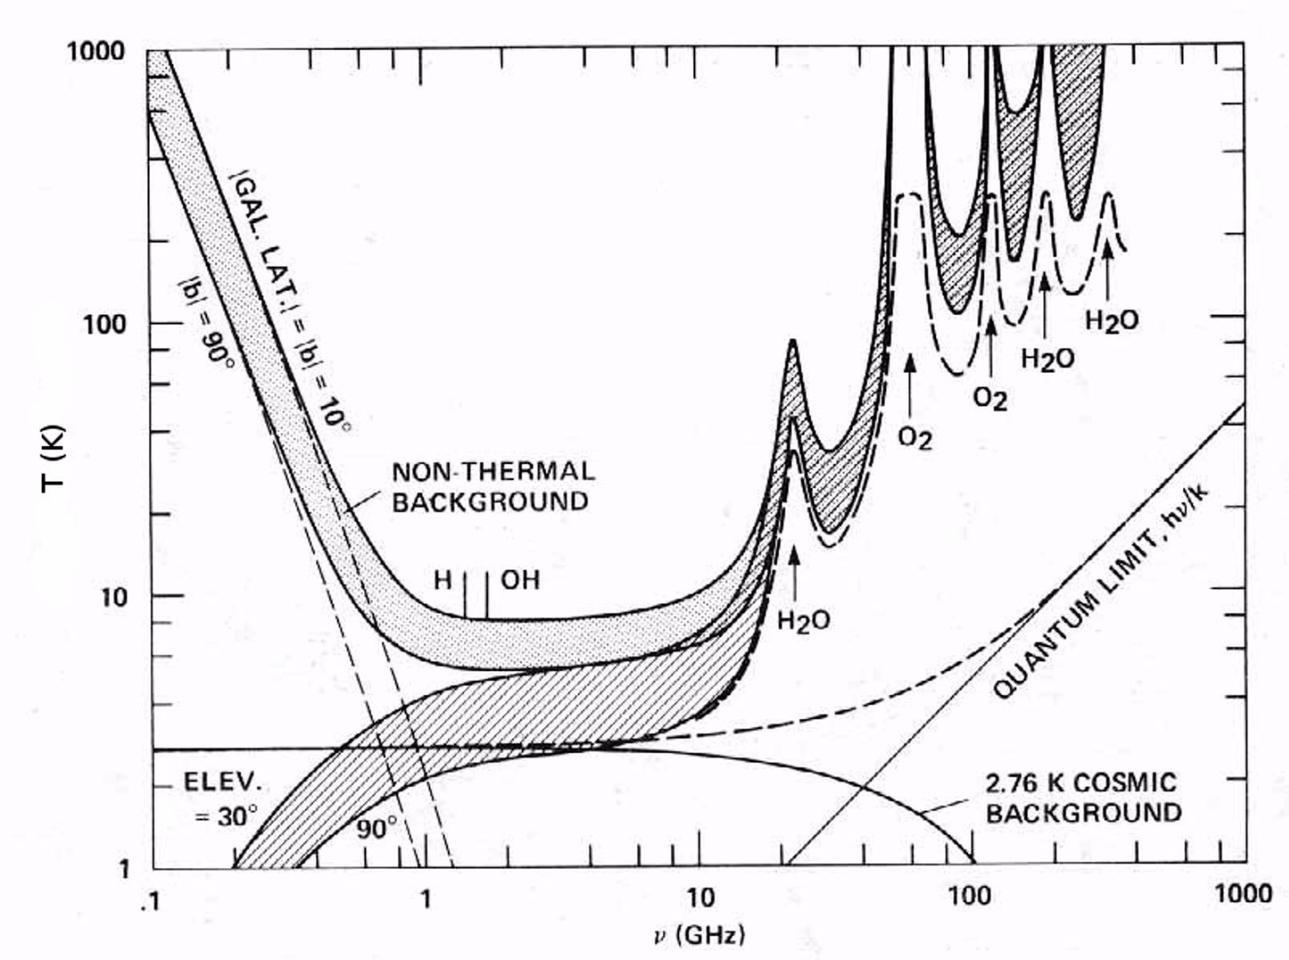 Diagram of the radio spectrum showing communication windows